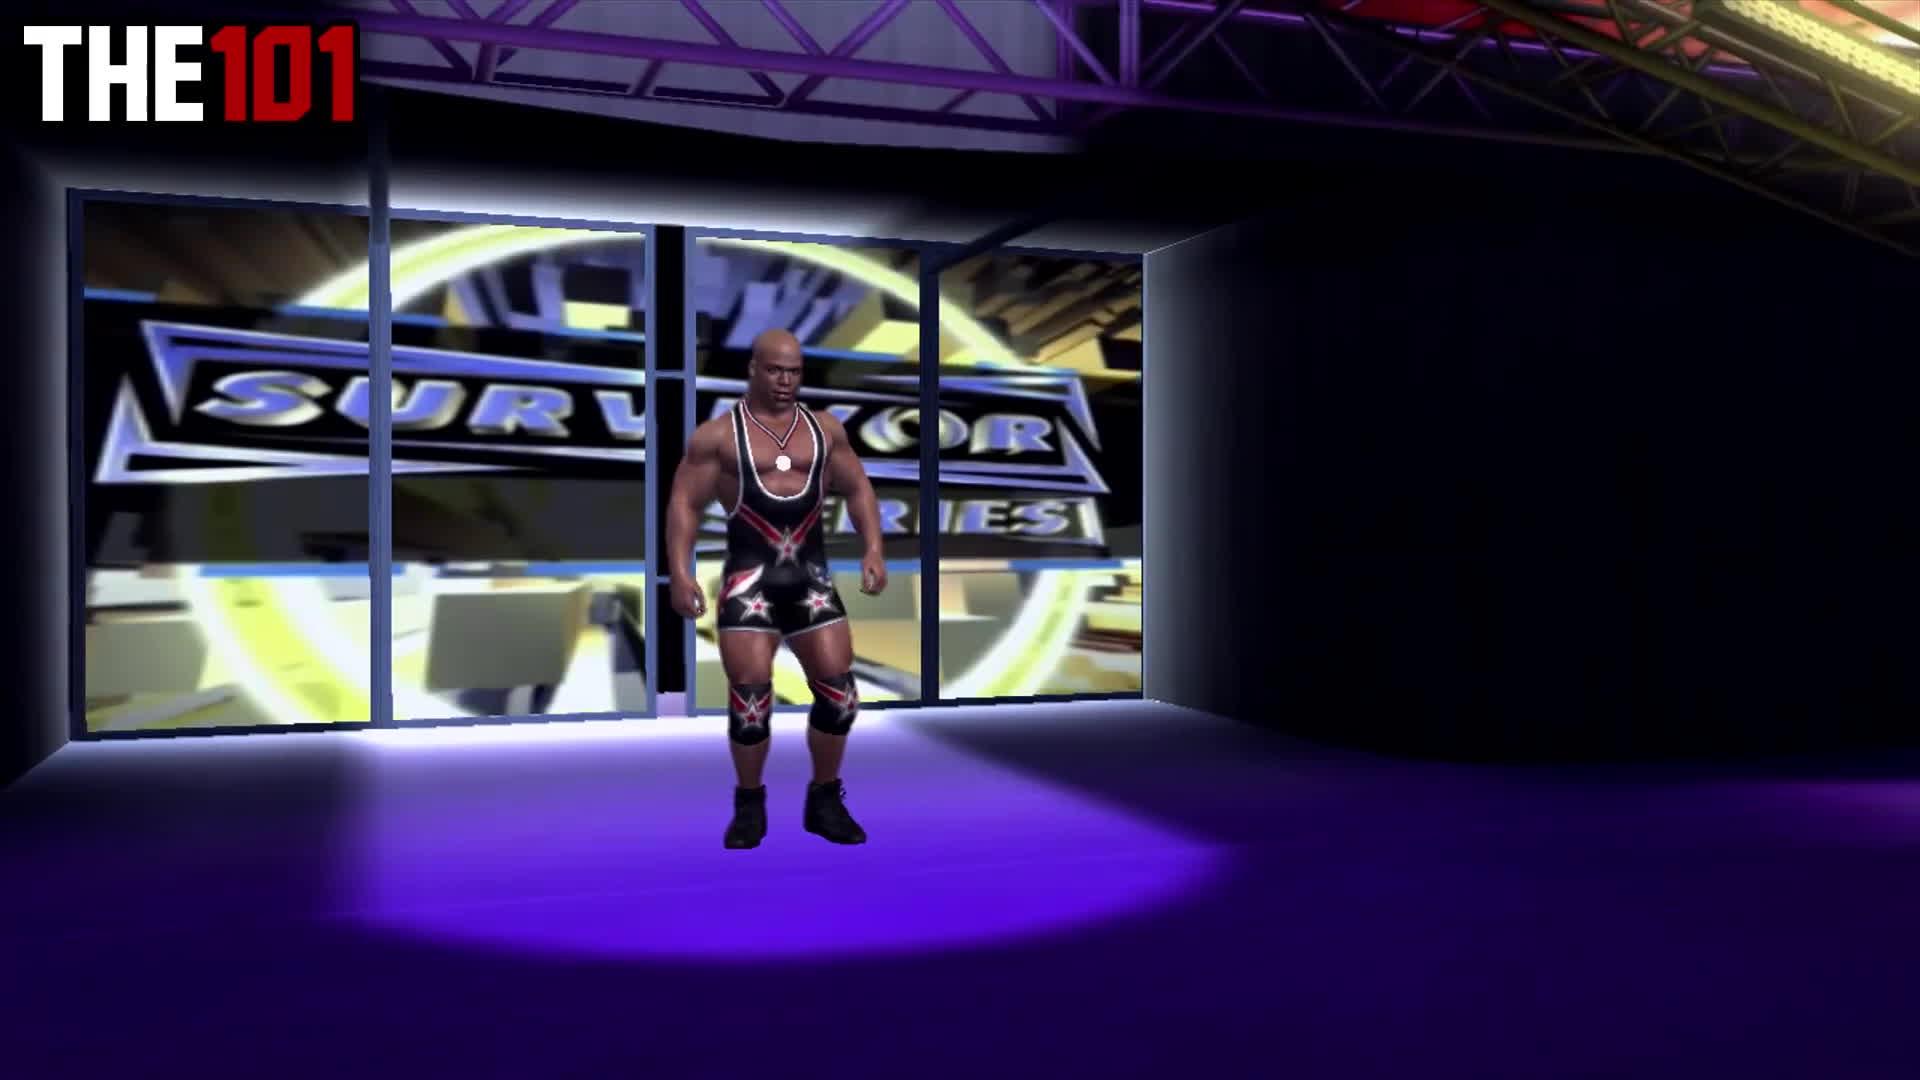 entrance evolutionkurt angle, wwegames, wwf, History Of Kurt Angle In WWEGames - Kurt Angle Entrance Evolution! (Smackdown 2 - SVR 2007) GIFs